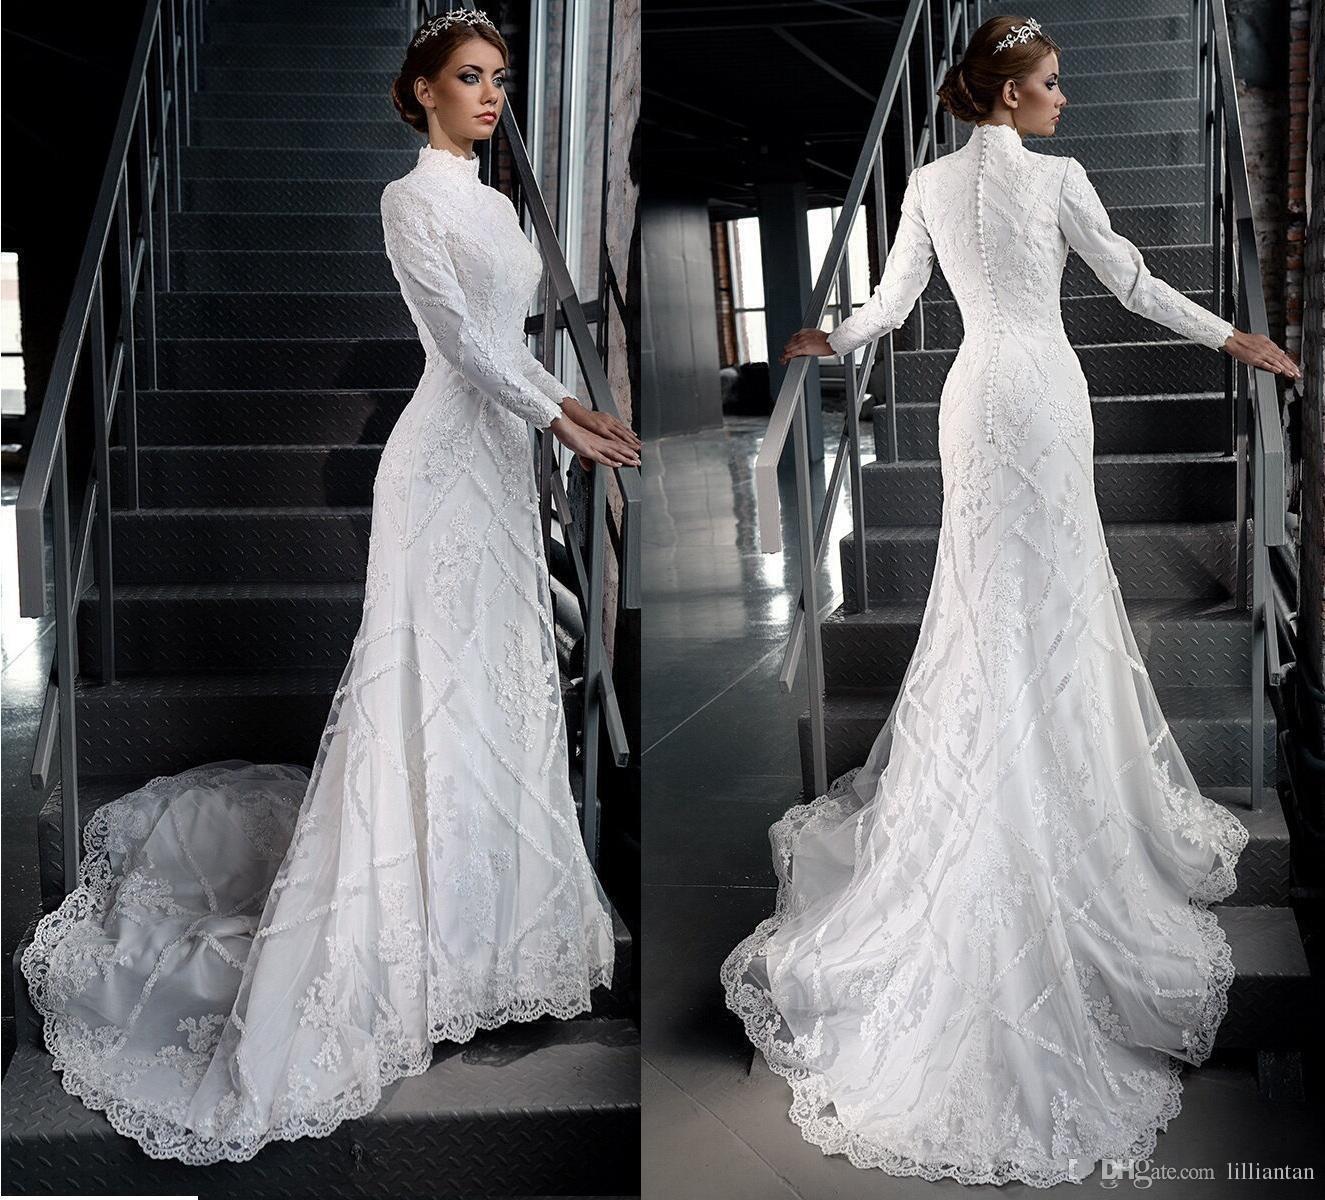 Discount Vintage Modest Lace Wedding Dresses Long Sleeve Tradional Catholic Christian Gown Muslim Dubai Arabic Bridal Appliques Real Image: Bridal Lace Wedding Dress At Reisefeber.org